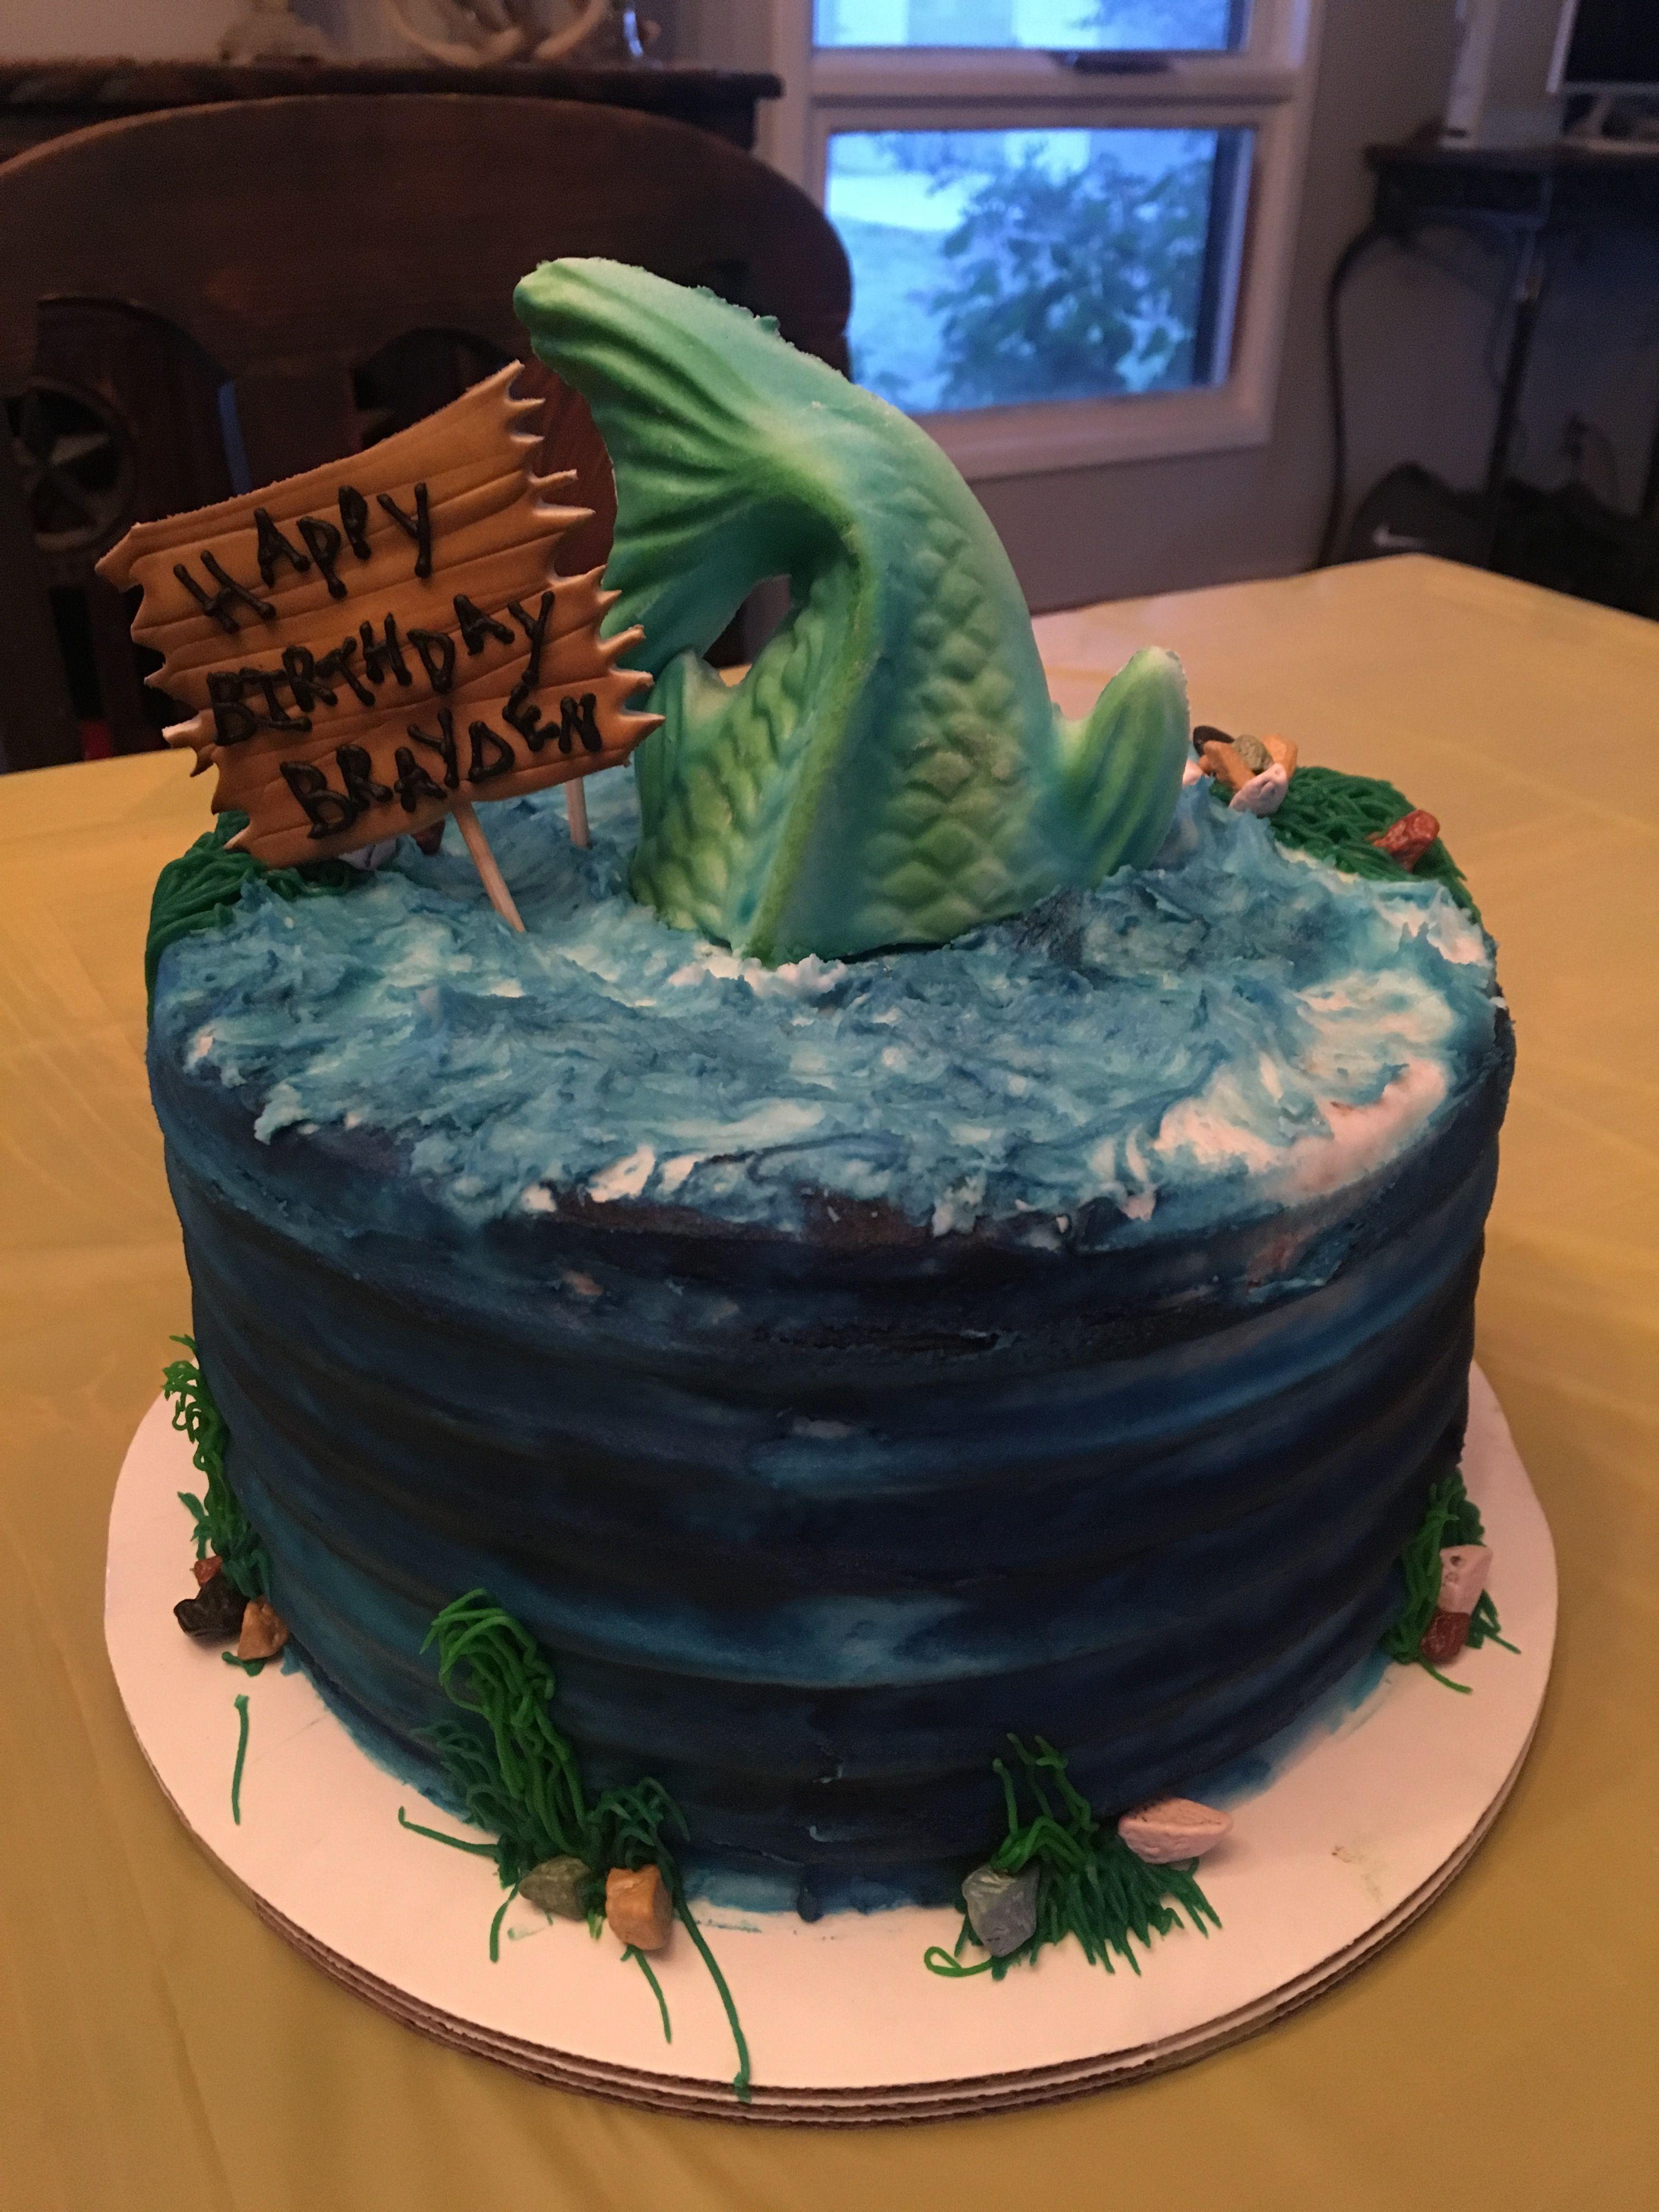 Fishing cake 13th birthday boy with images birthday